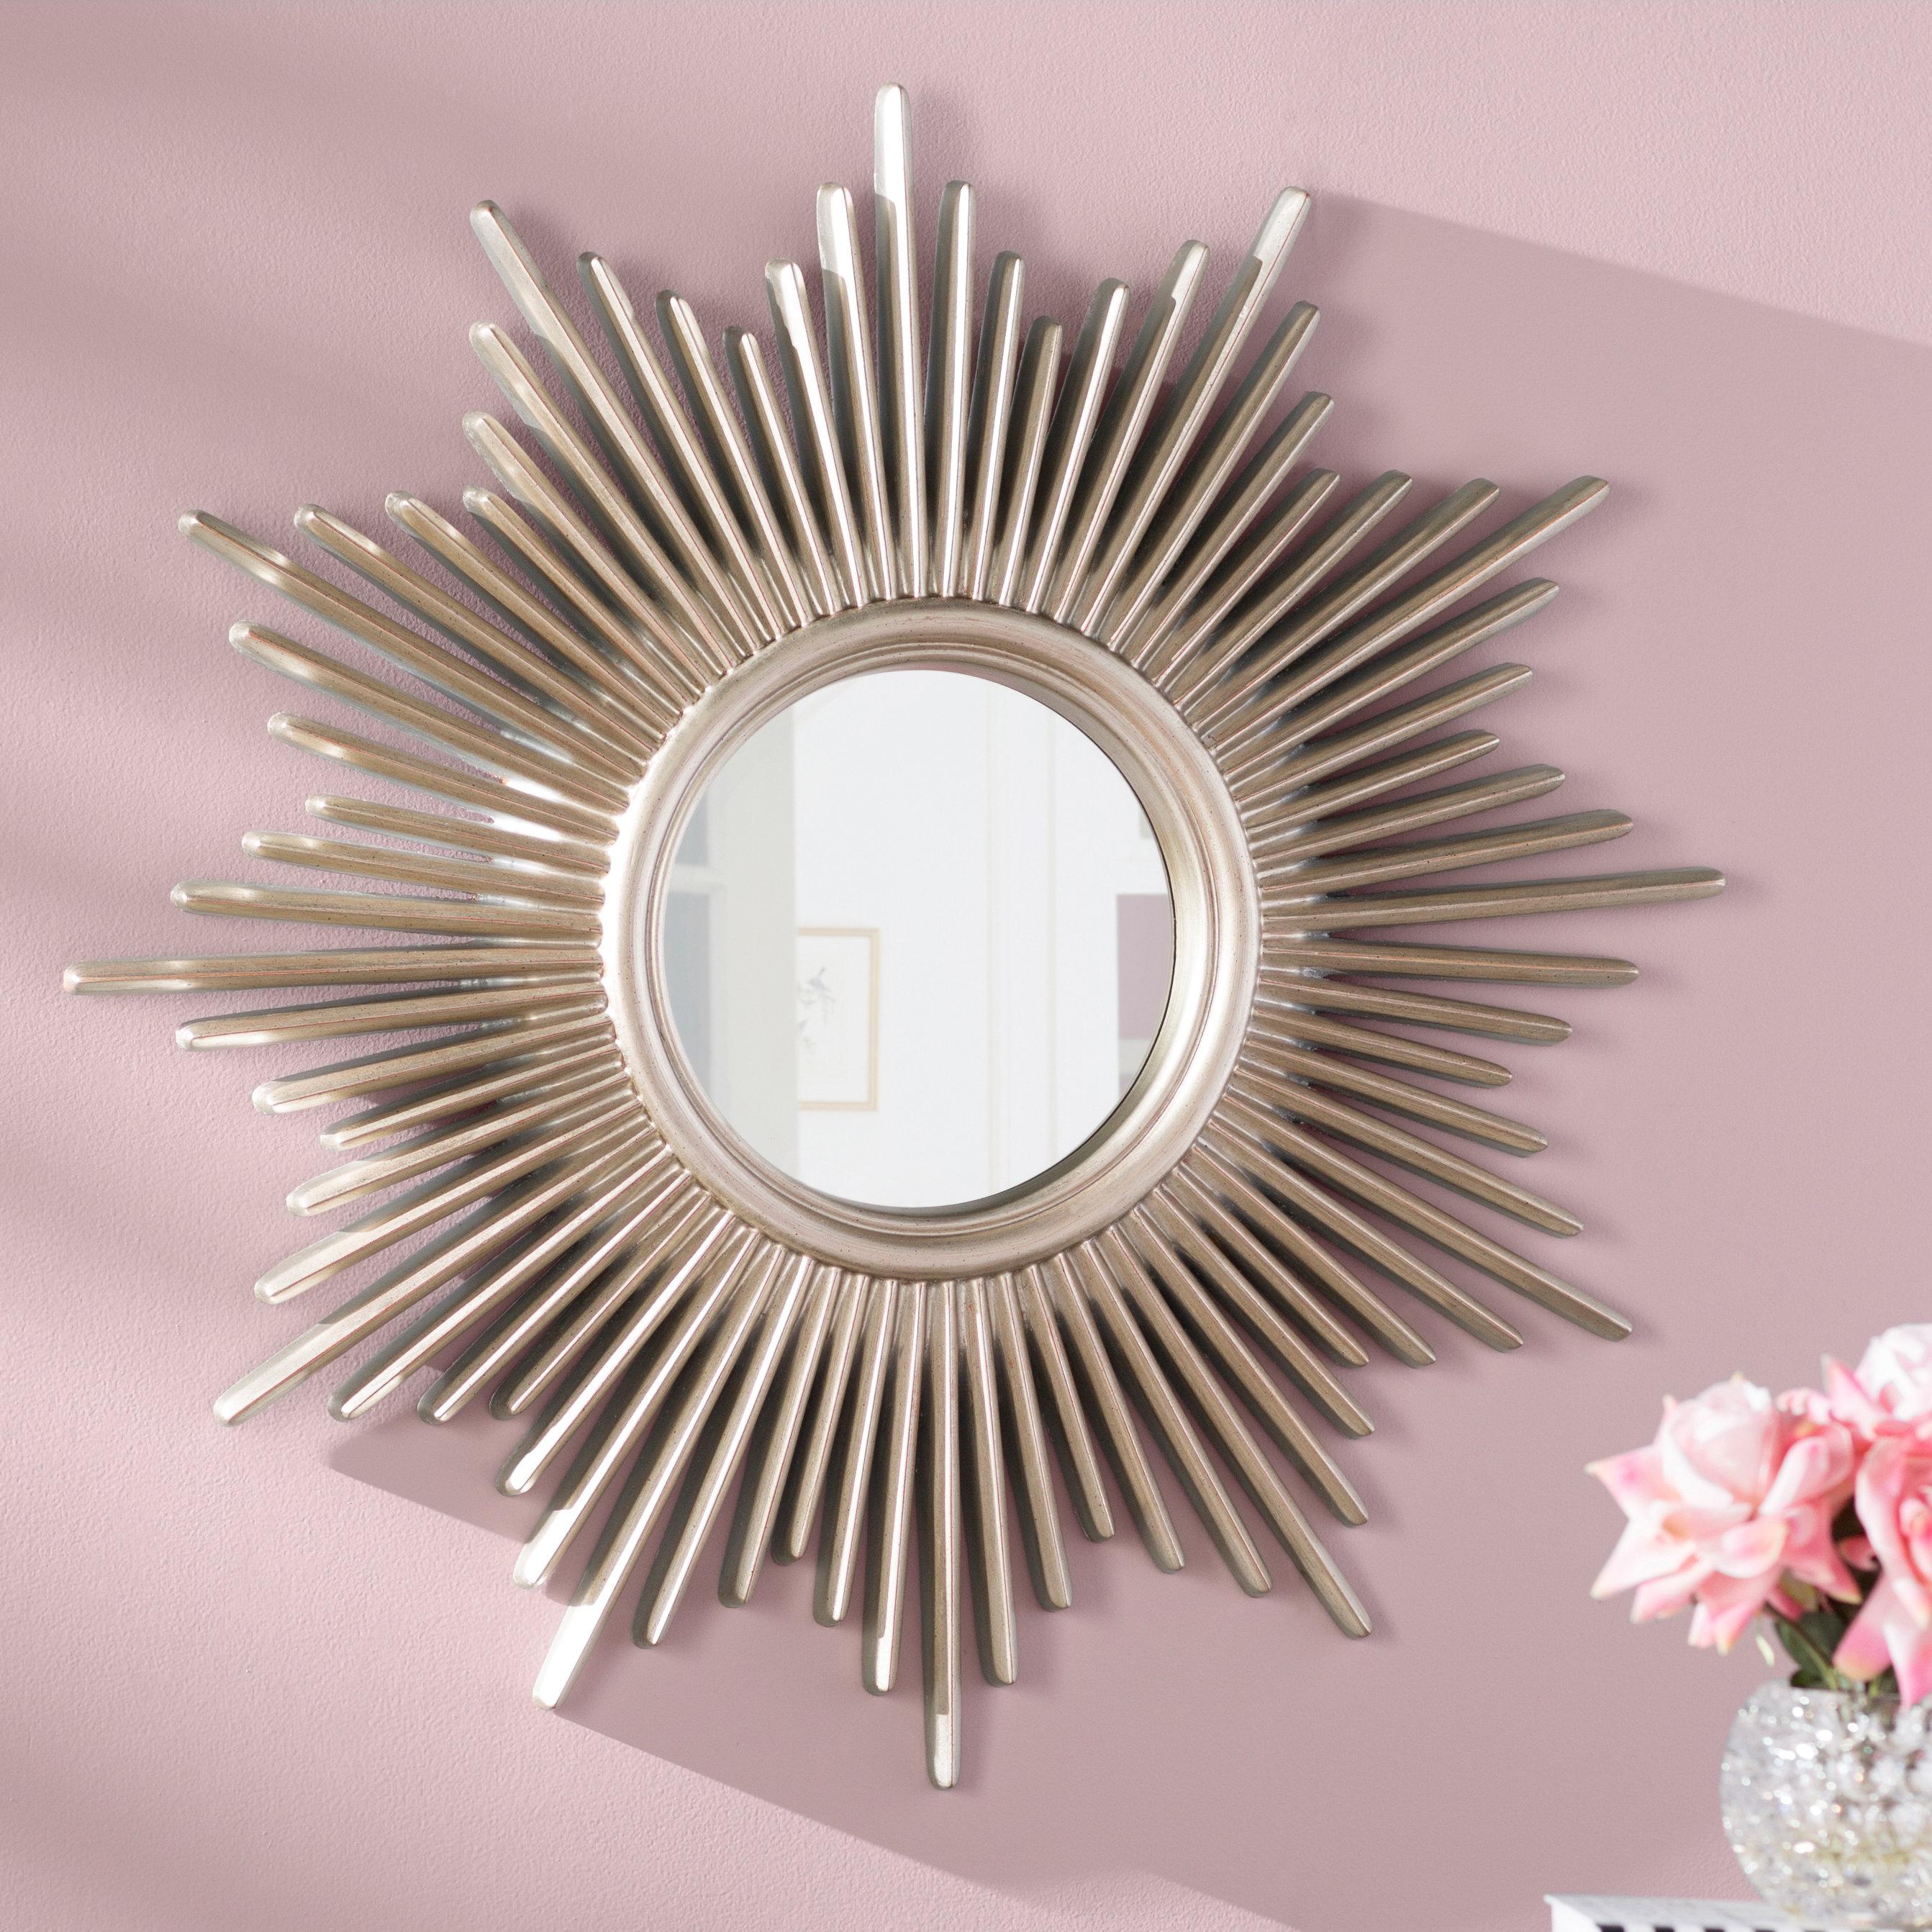 Willa Arlo Interiors Josephson Starburst Glam Beveled Accent In Estrela Modern Sunburst Metal Wall Mirrors (View 19 of 20)